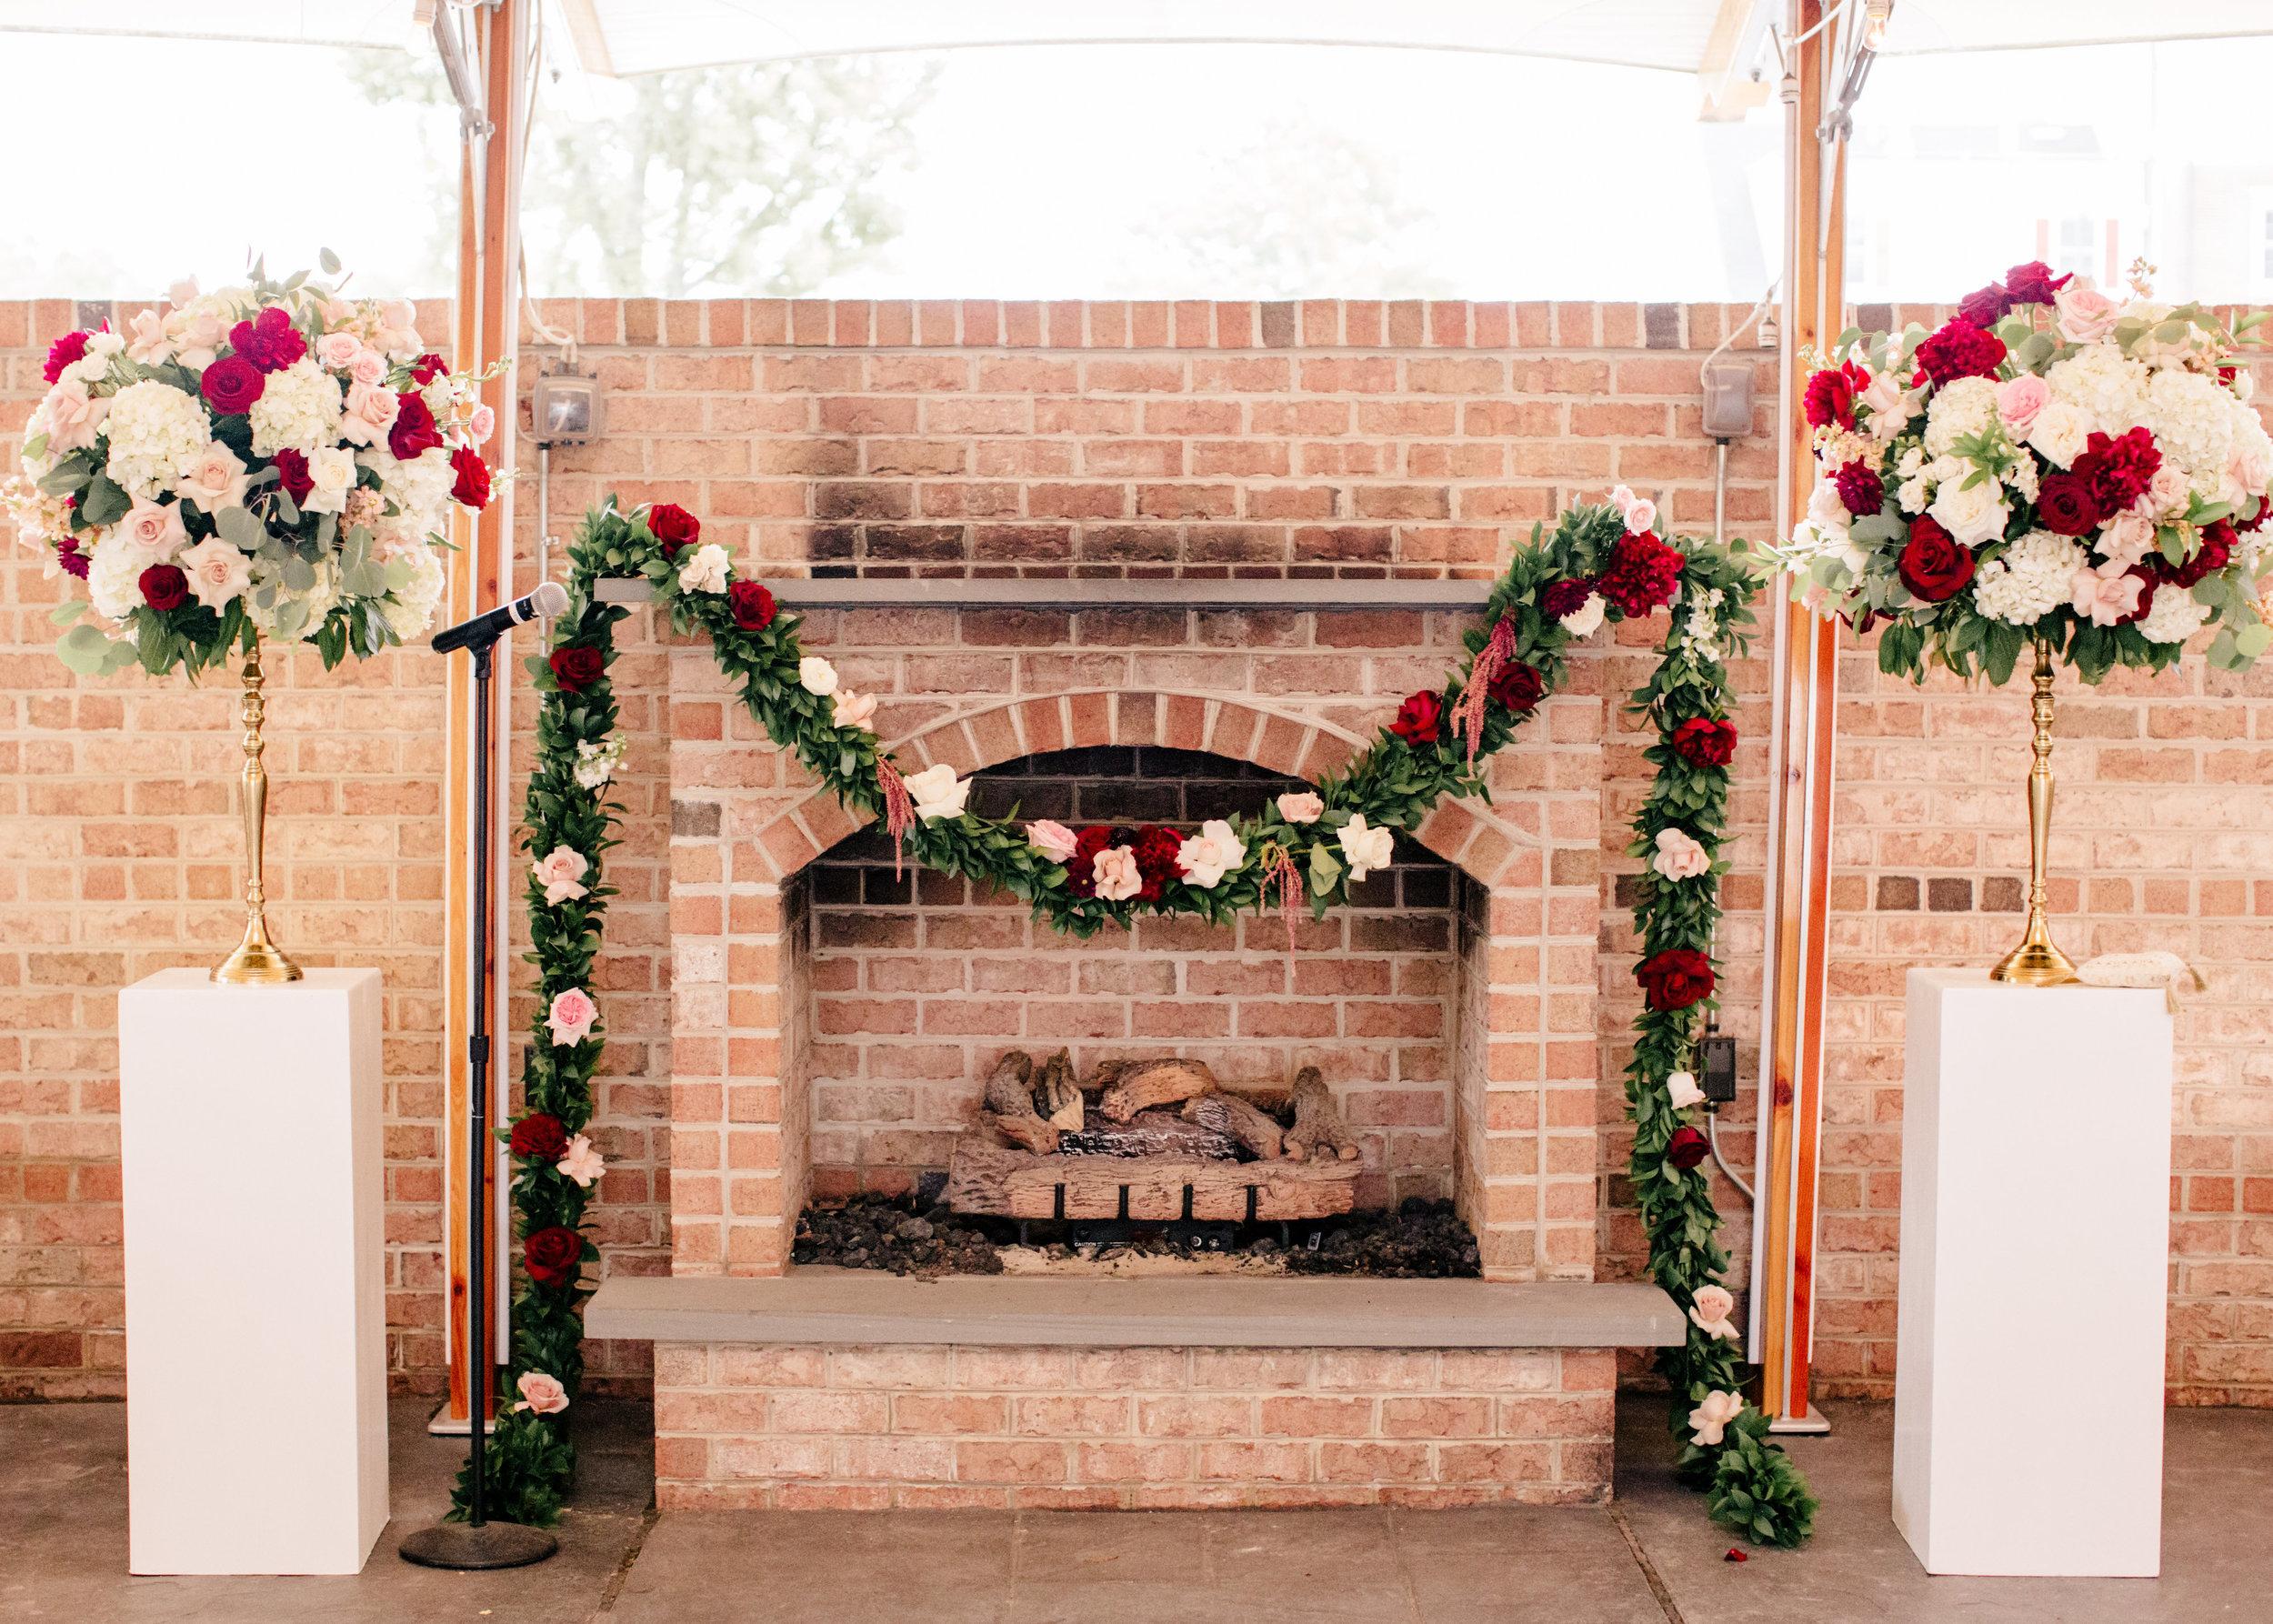 Courtney Inghram Tidewater Inn Easton Maryland Destination Wedding Florist